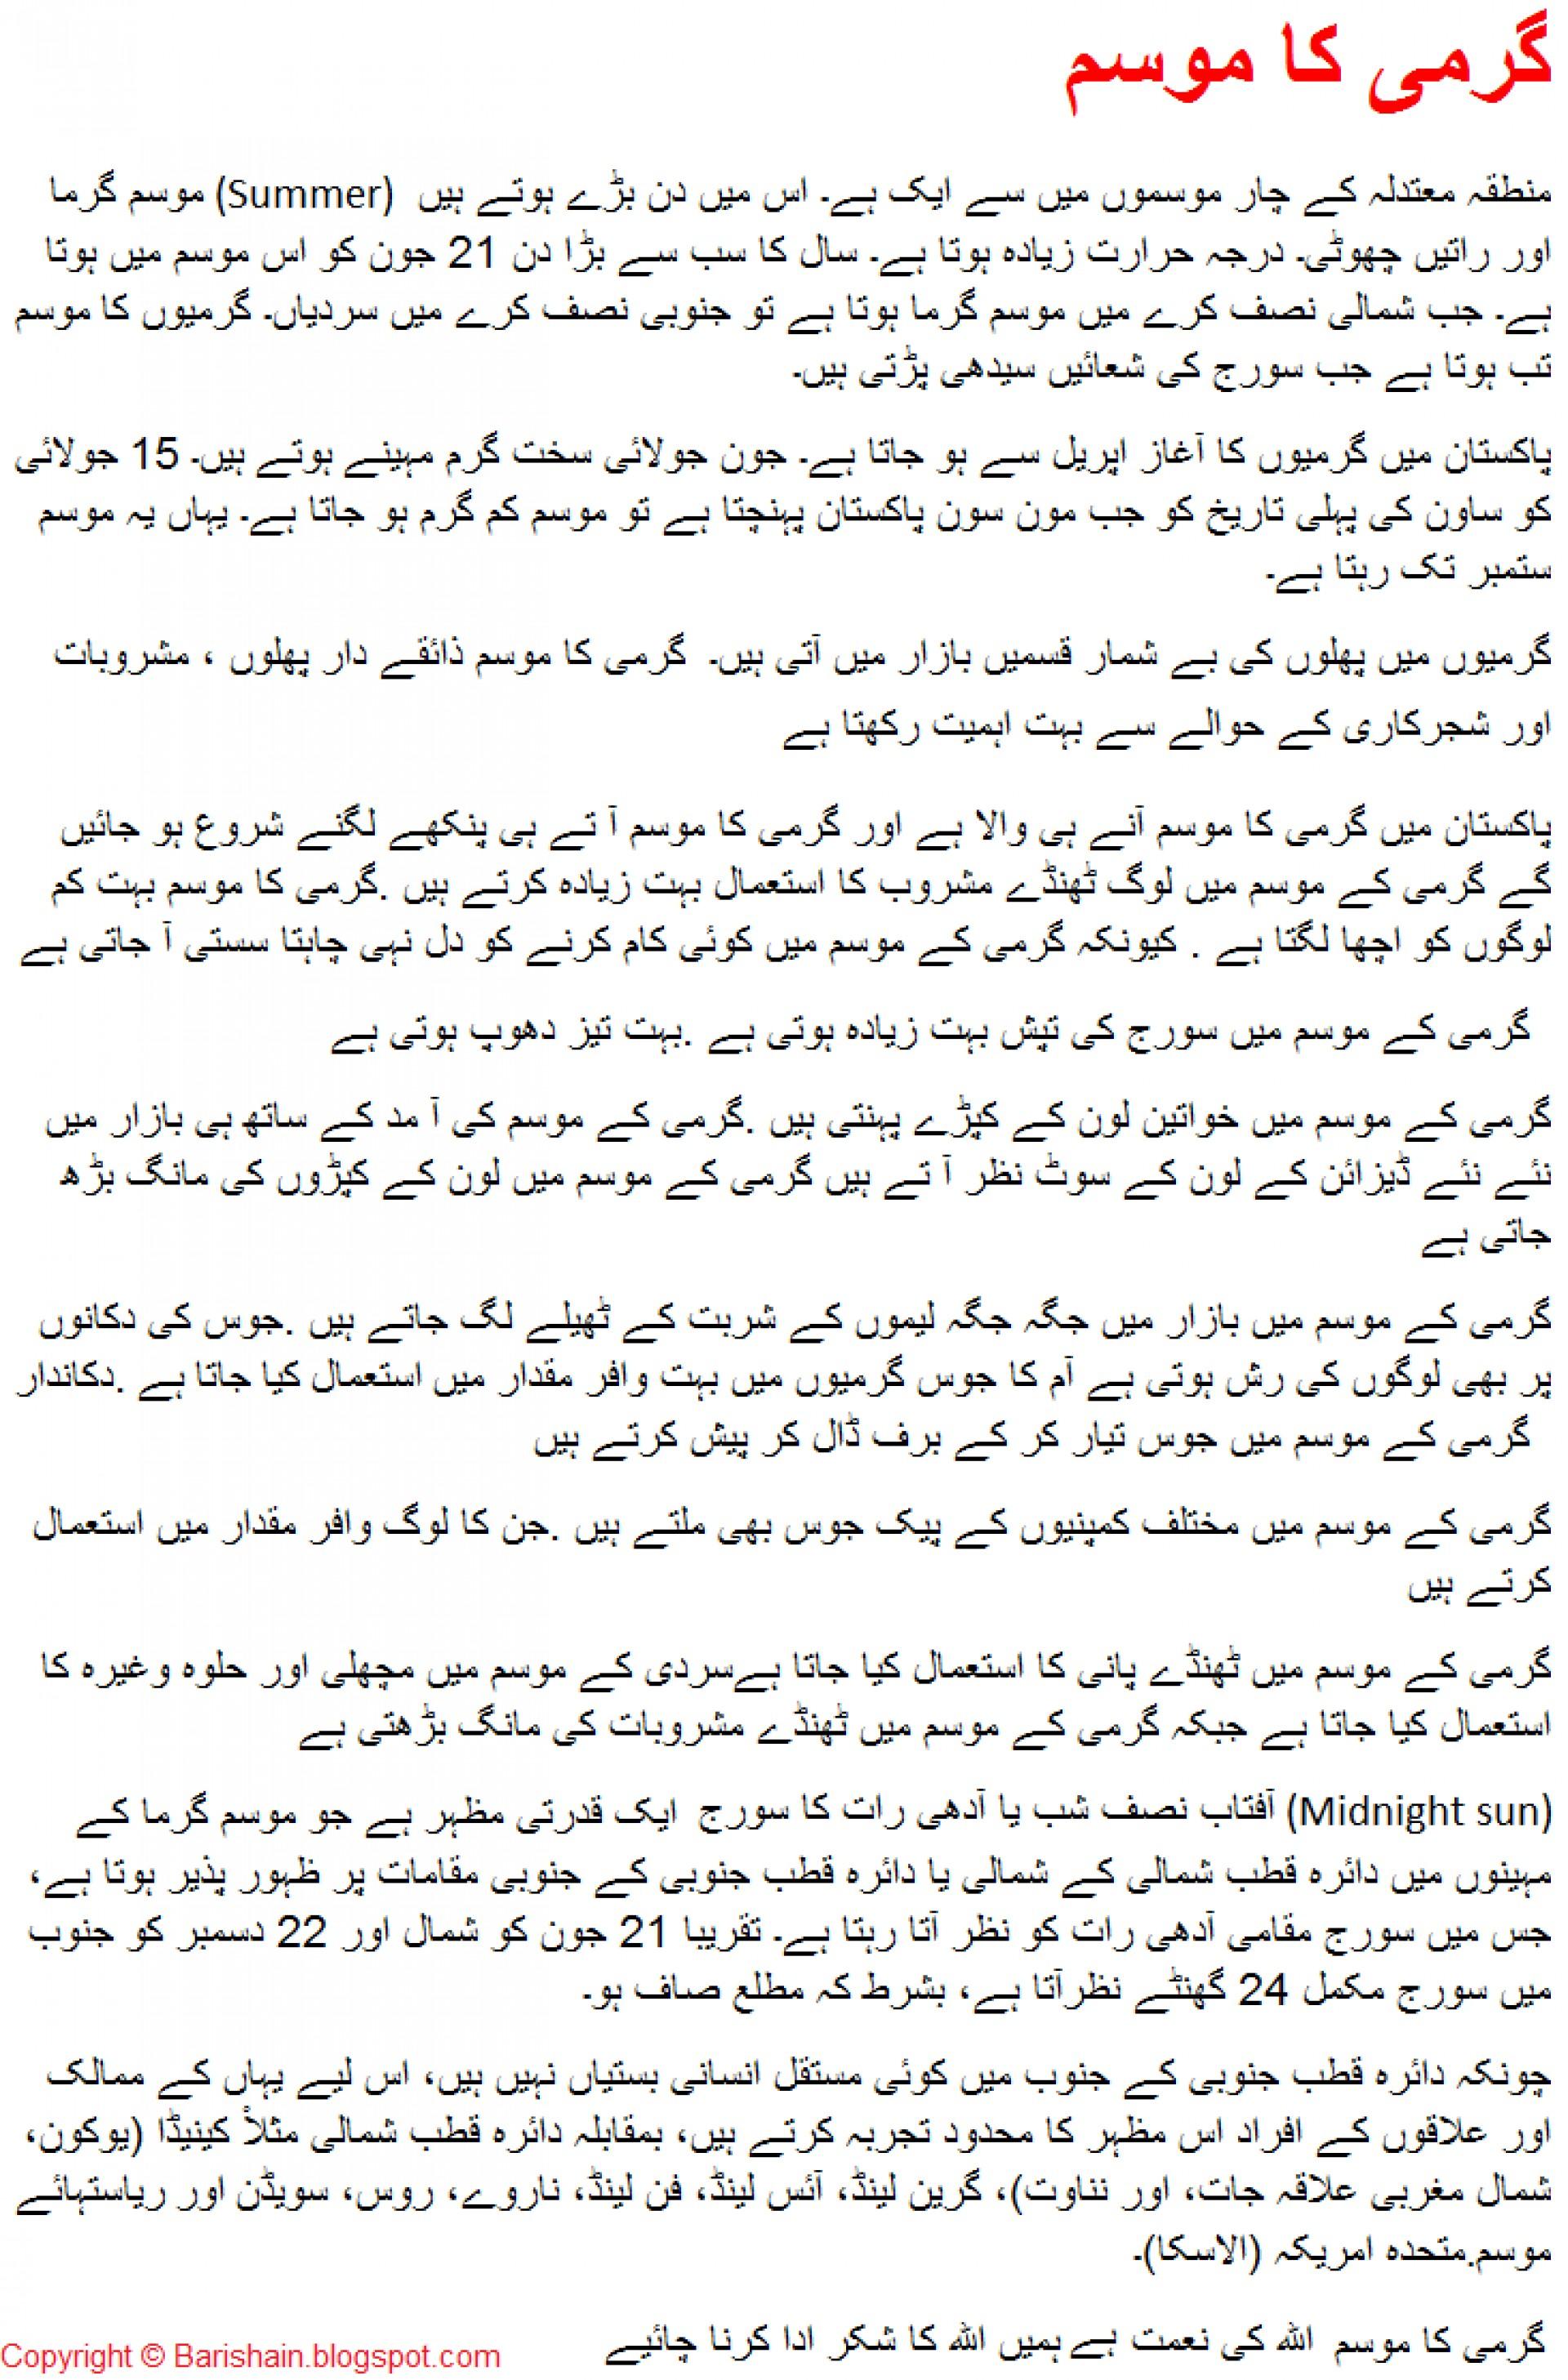 009 Summer2bseason2bin2burdu Essay Example Summer Frightening Vacation In Hindi 300-400 Words On For Class 2 Students Urdu How I Spend My 1920